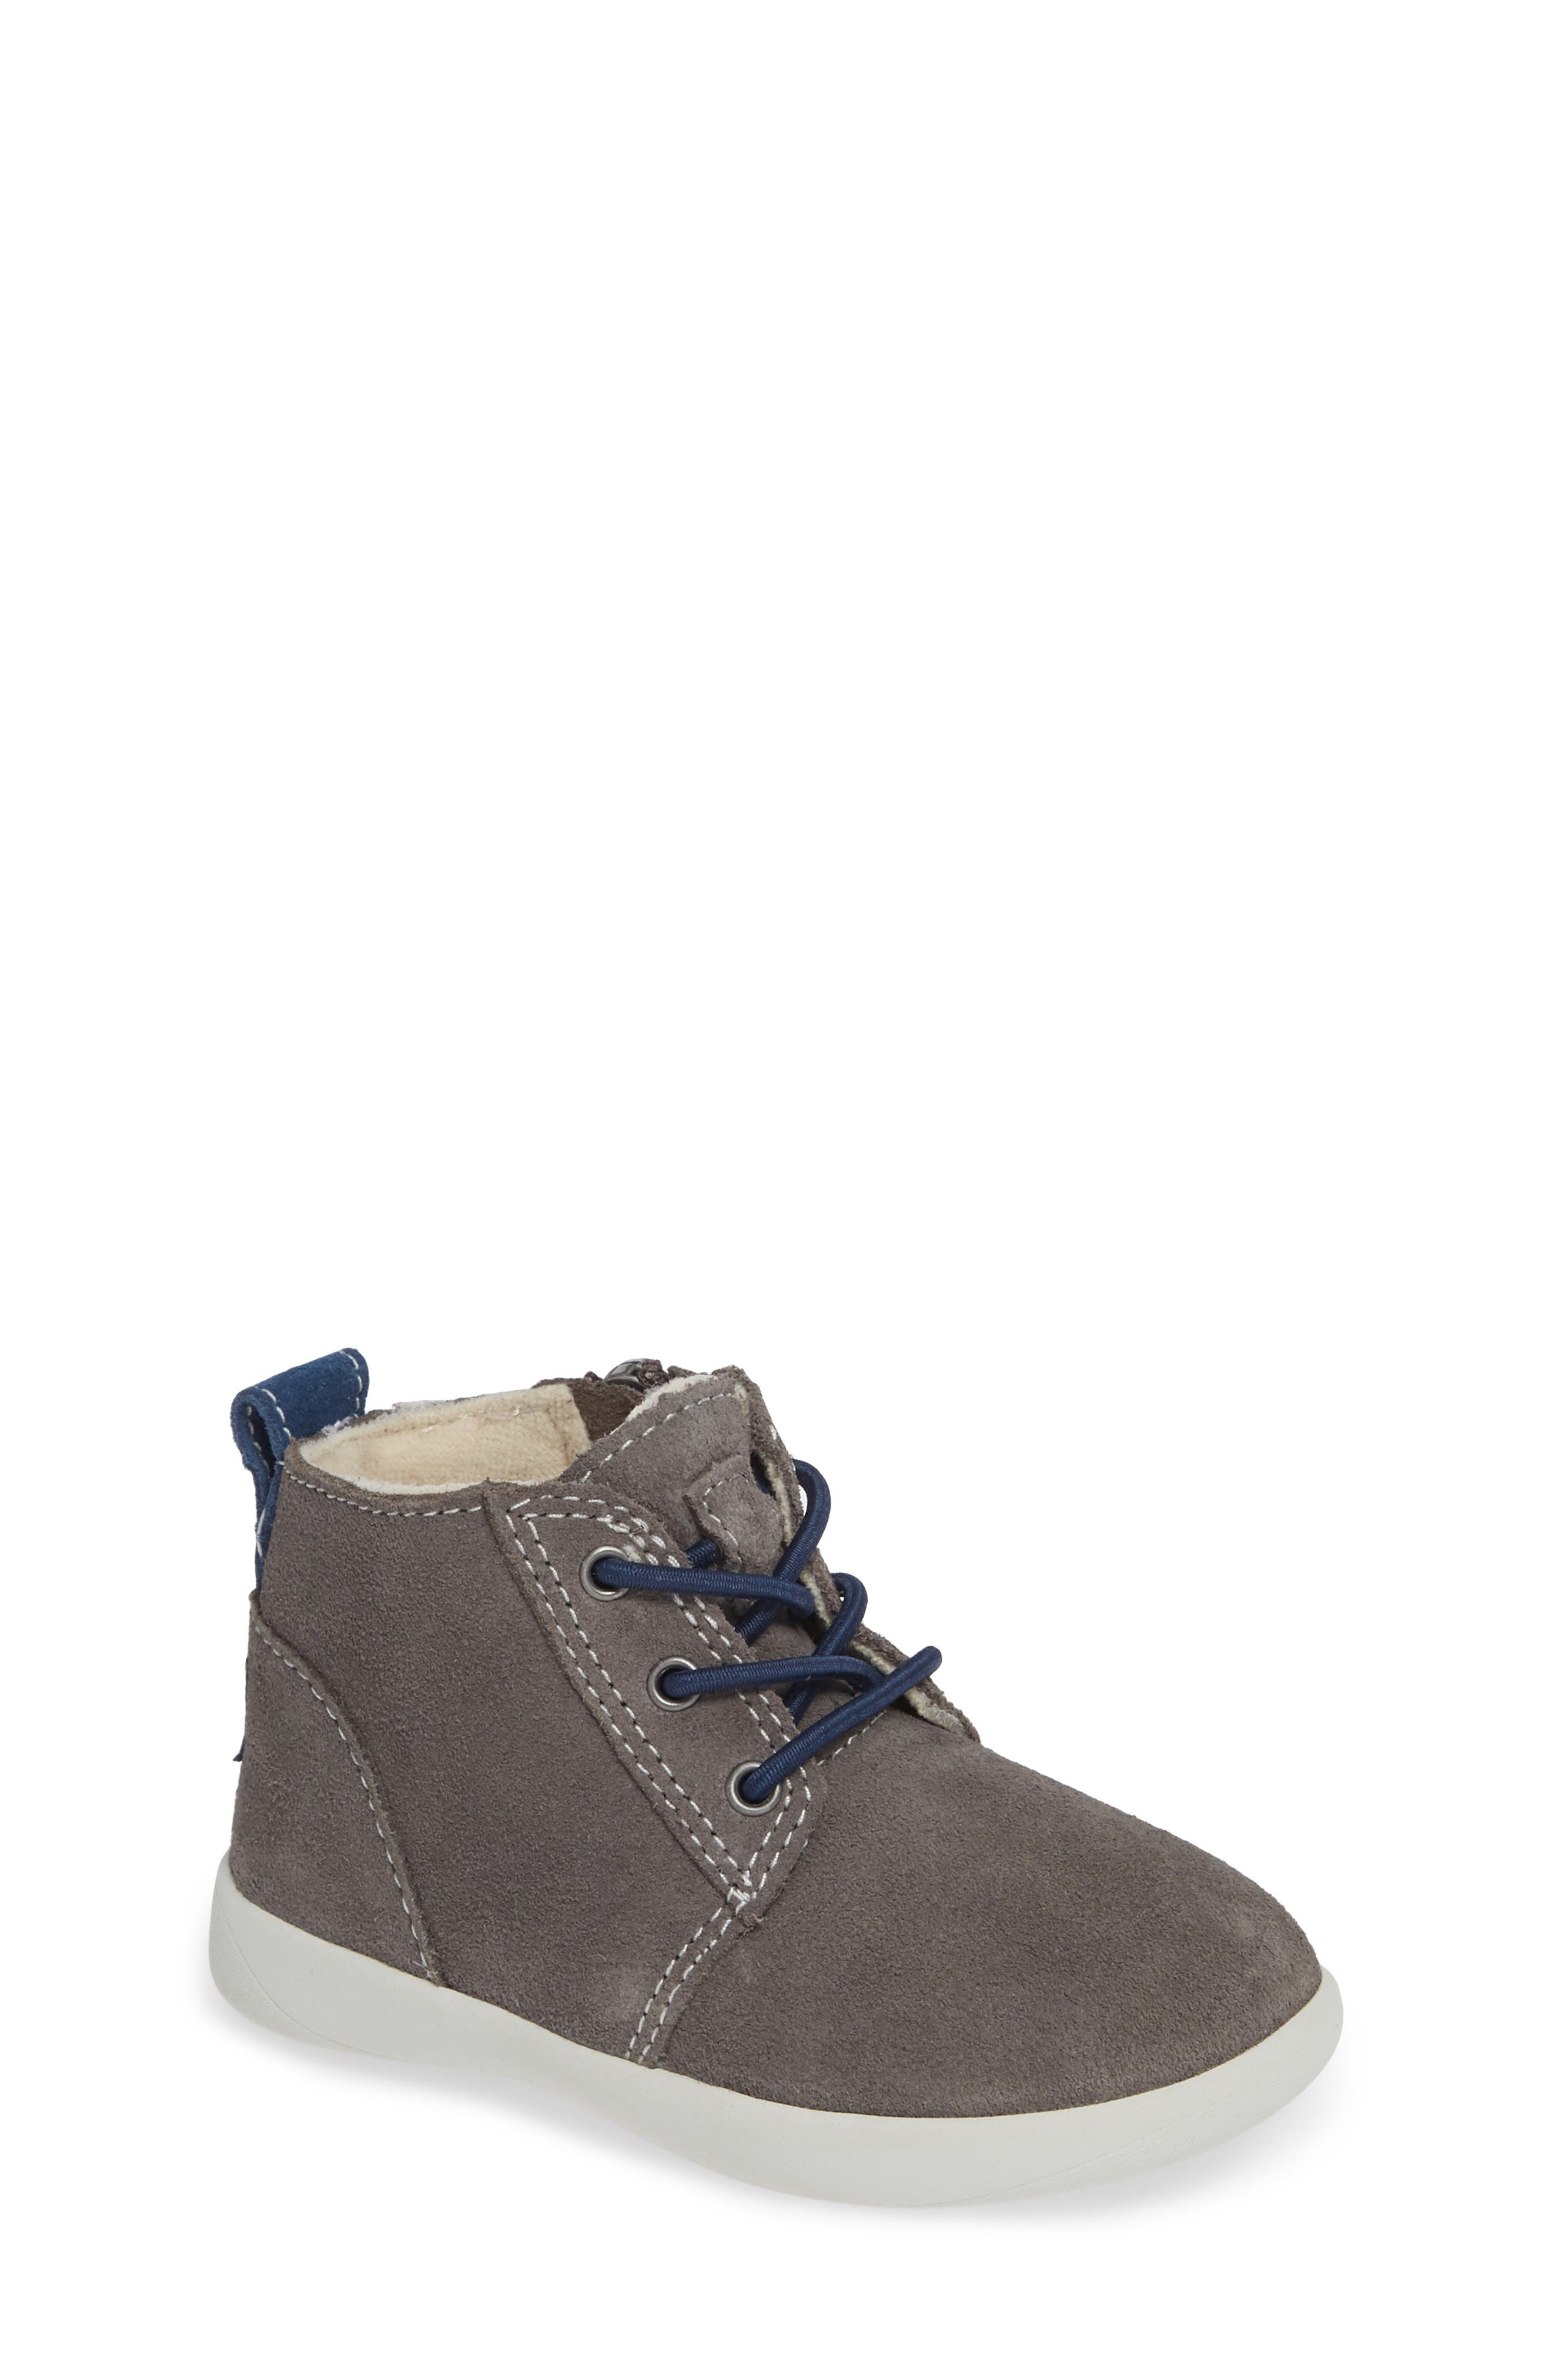 UGG<SUP>®</SUP>, Kristjan Chukka Sneaker, Main thumbnail 1, color, CHARCOAL GREY